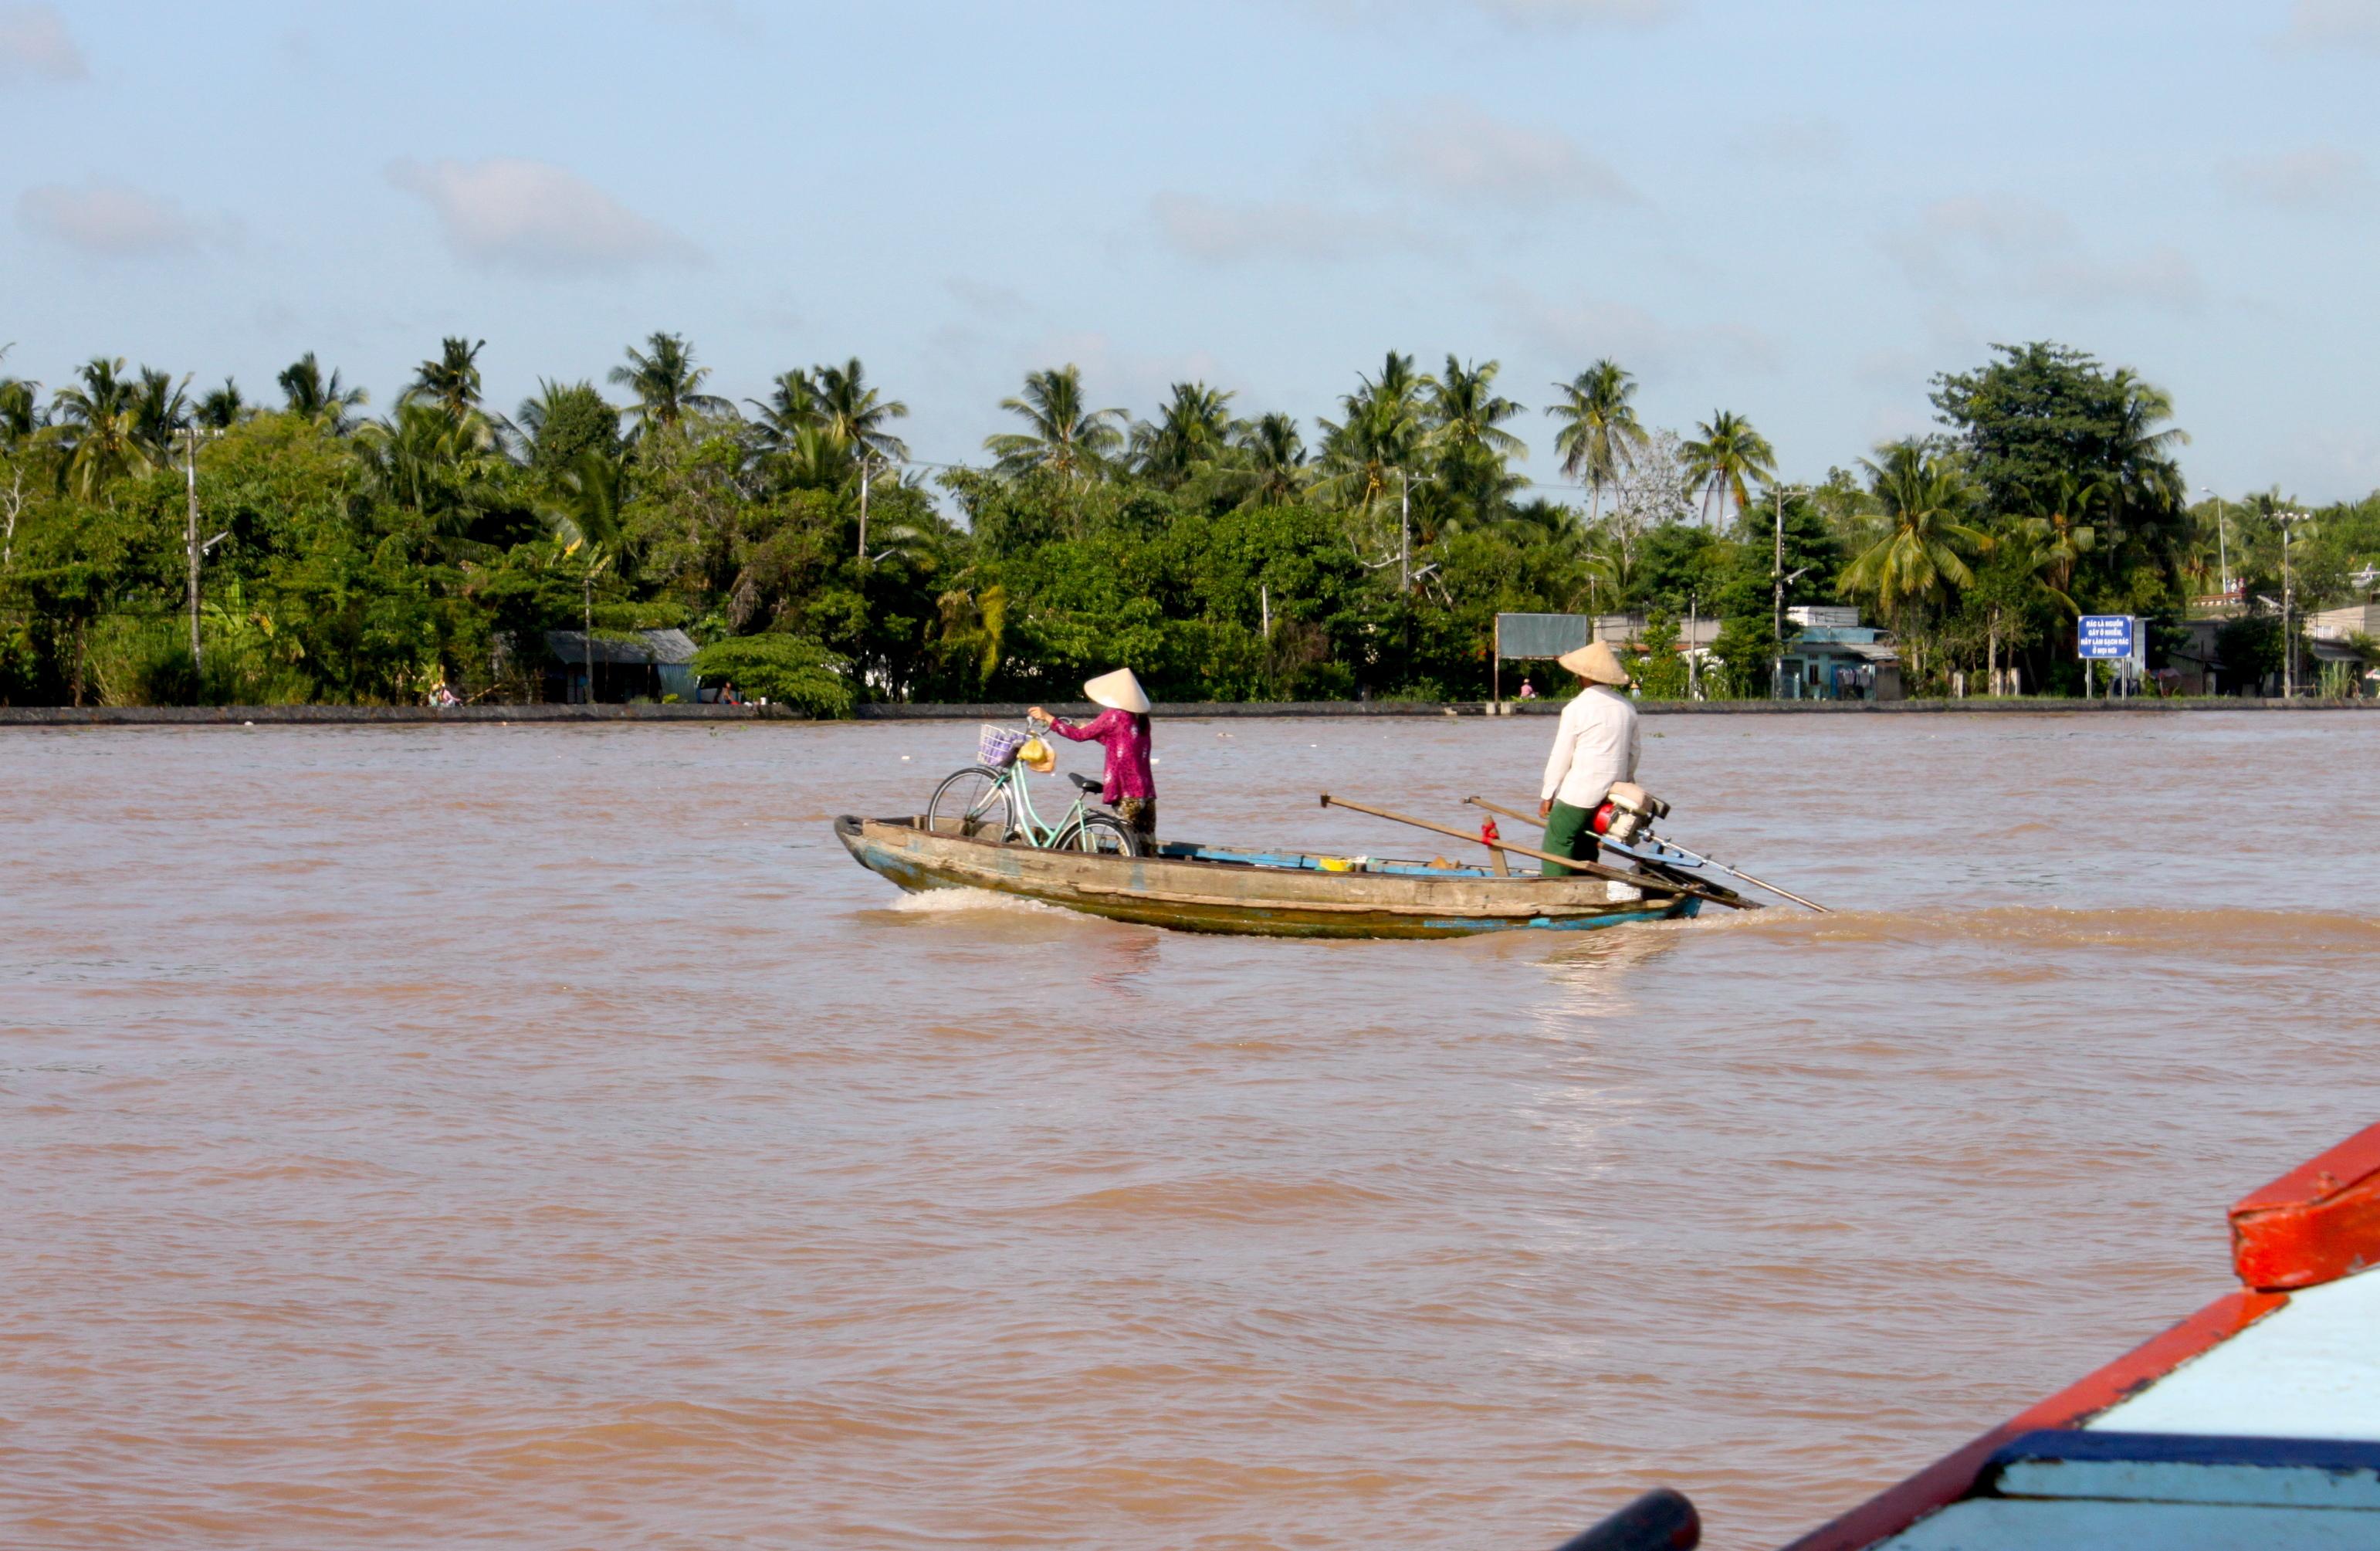 Verso i floating market